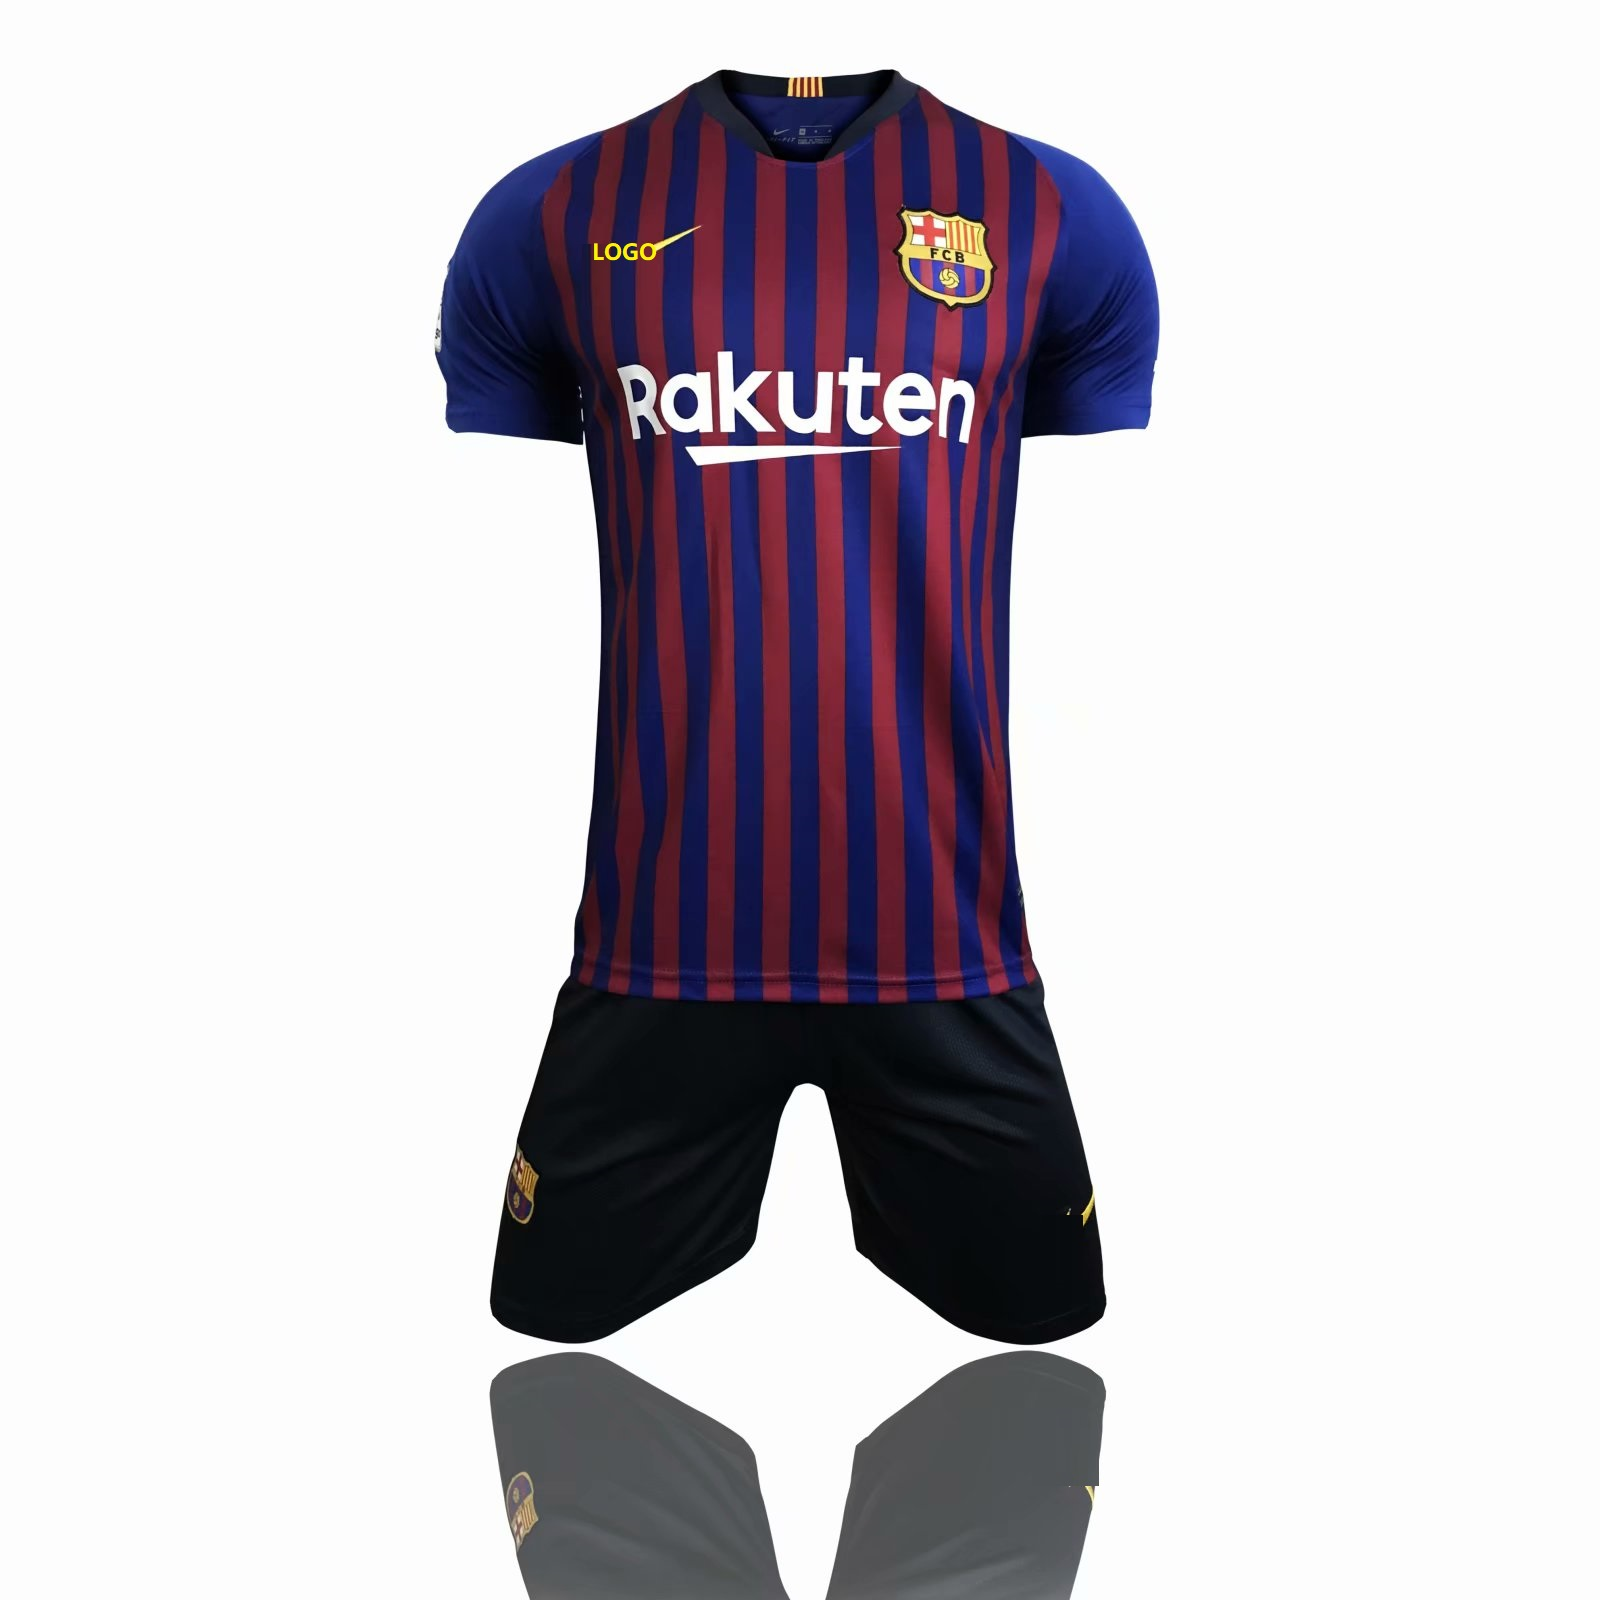 4be5ca950d6 18/19 Adult Barcelona Home Soccer Uniform Men Football Jersey Wholesale Custom  Name uniforme de fútbol Item NO: 526783